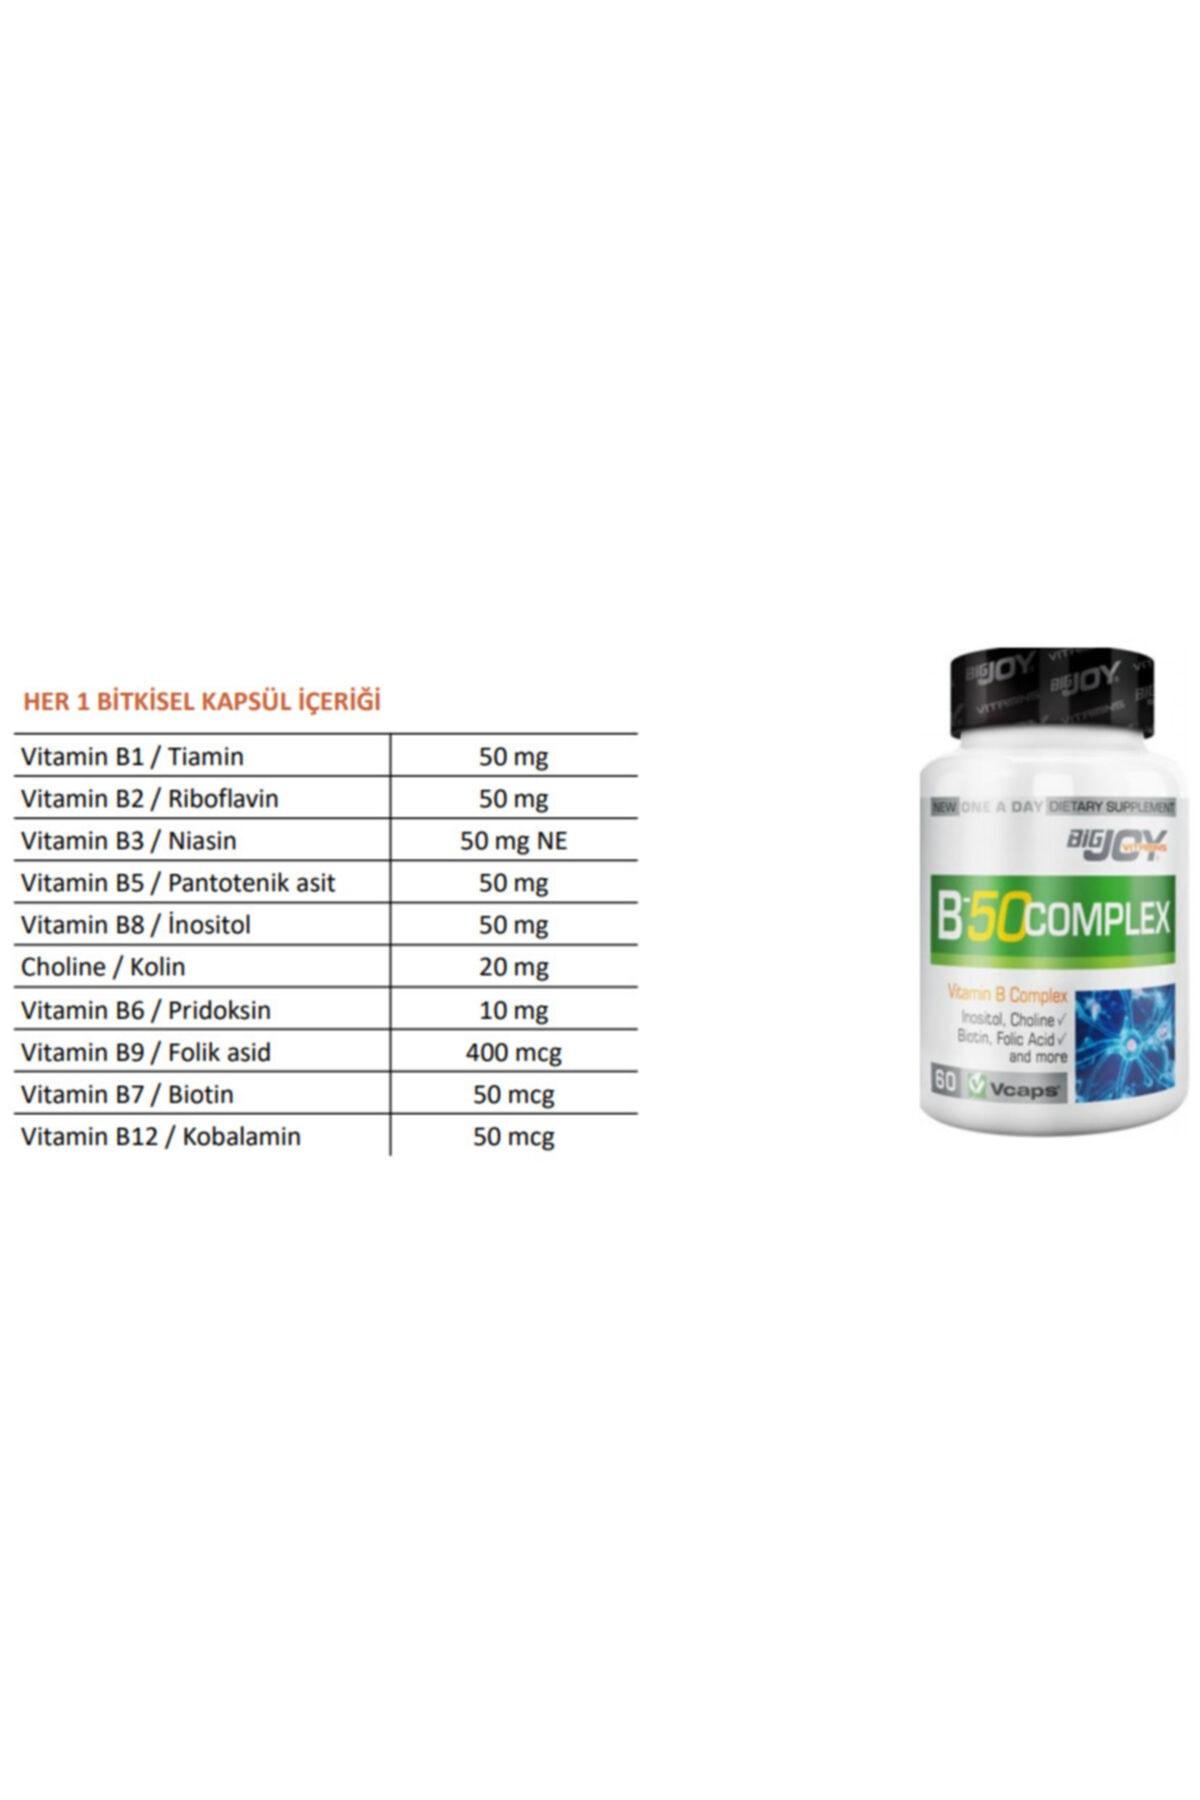 Big Joy Vitamin B-50 Complex 60 Kapsül 3 Adet 2